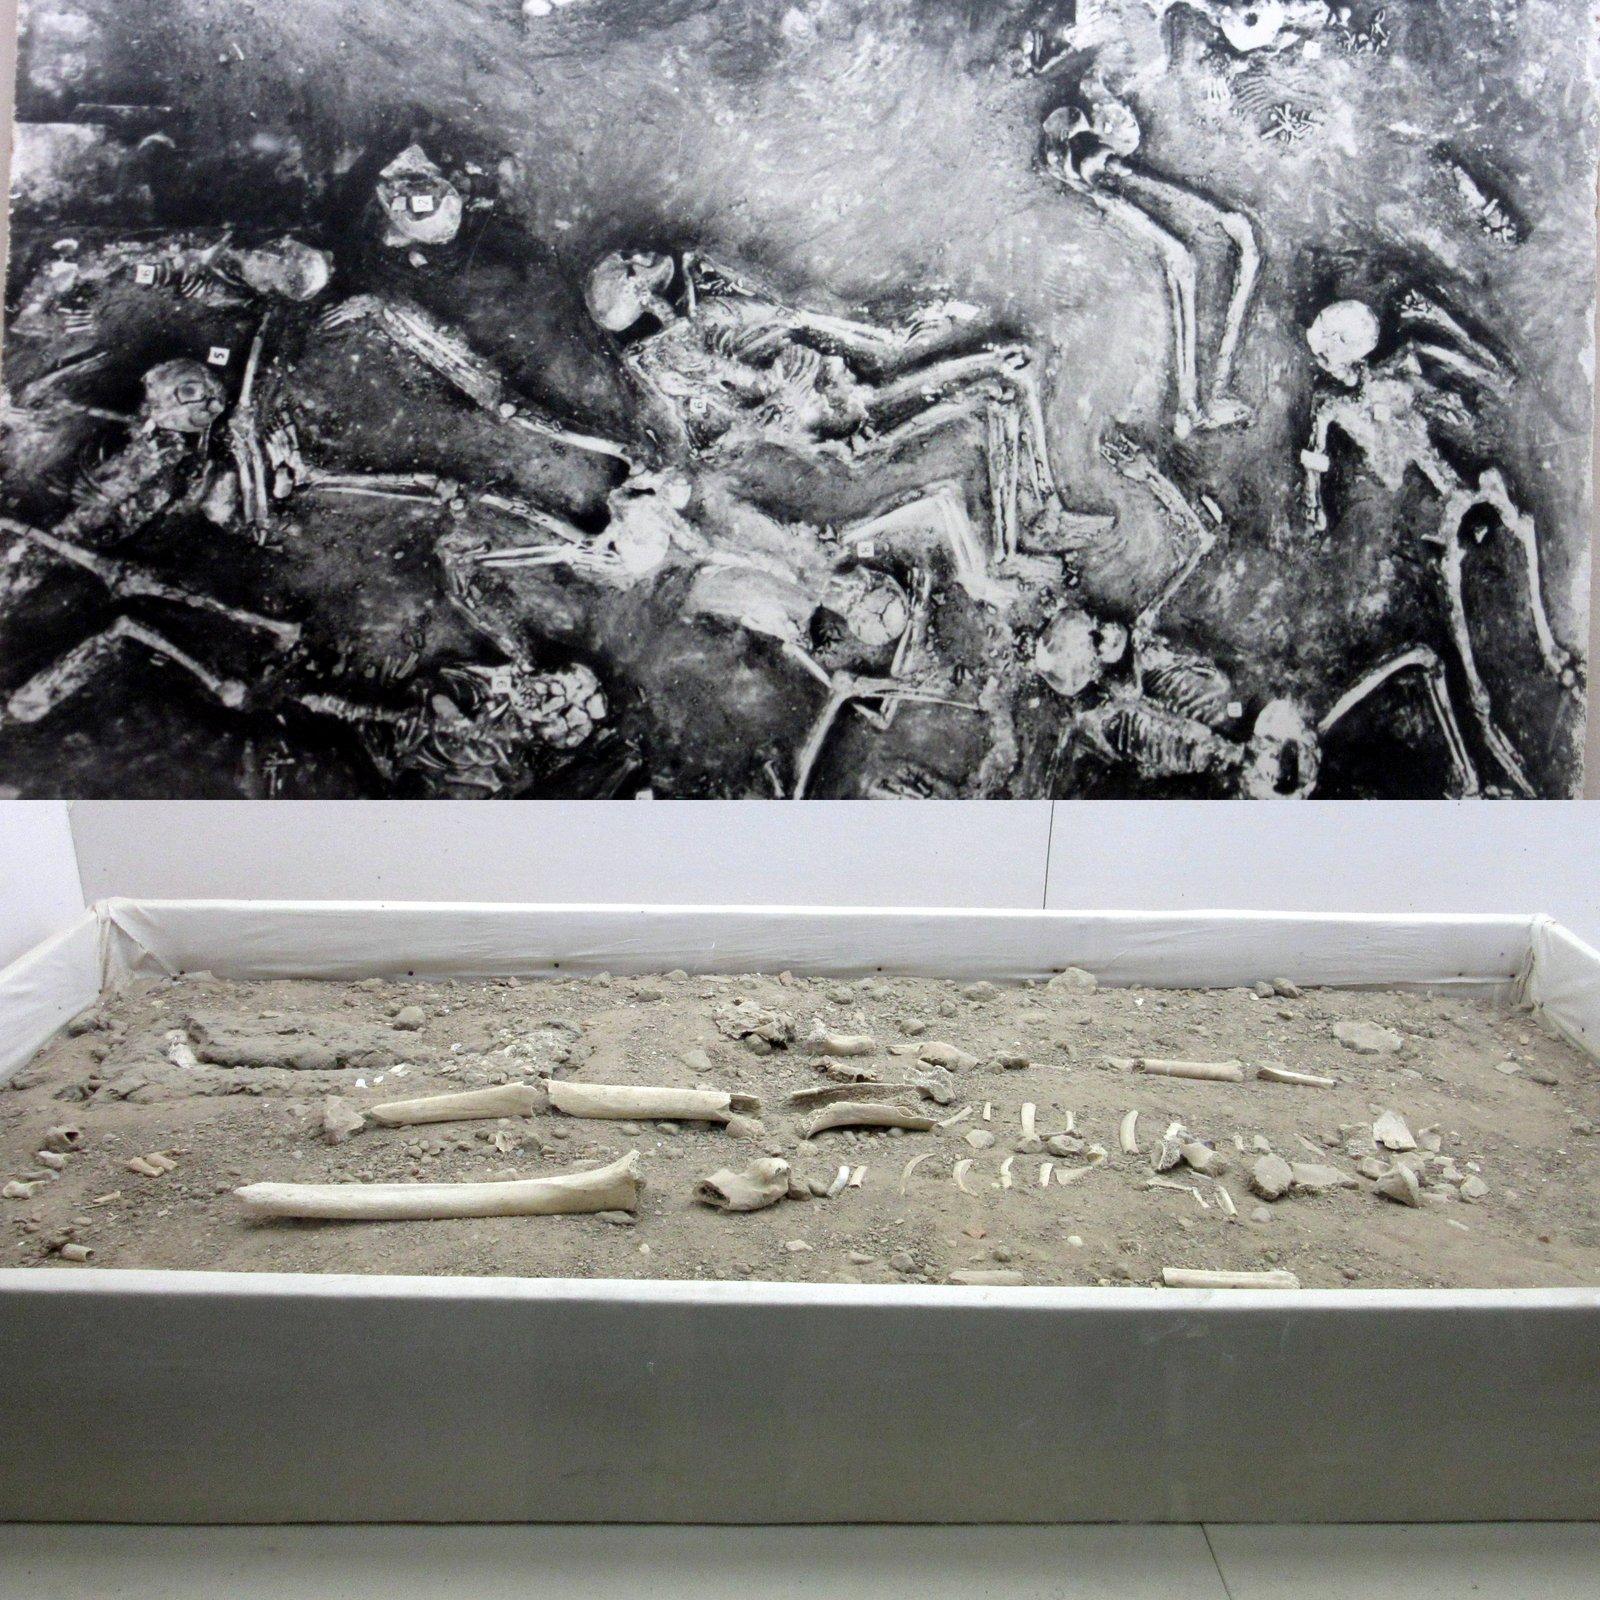 44 Skeletons Found in Single Room